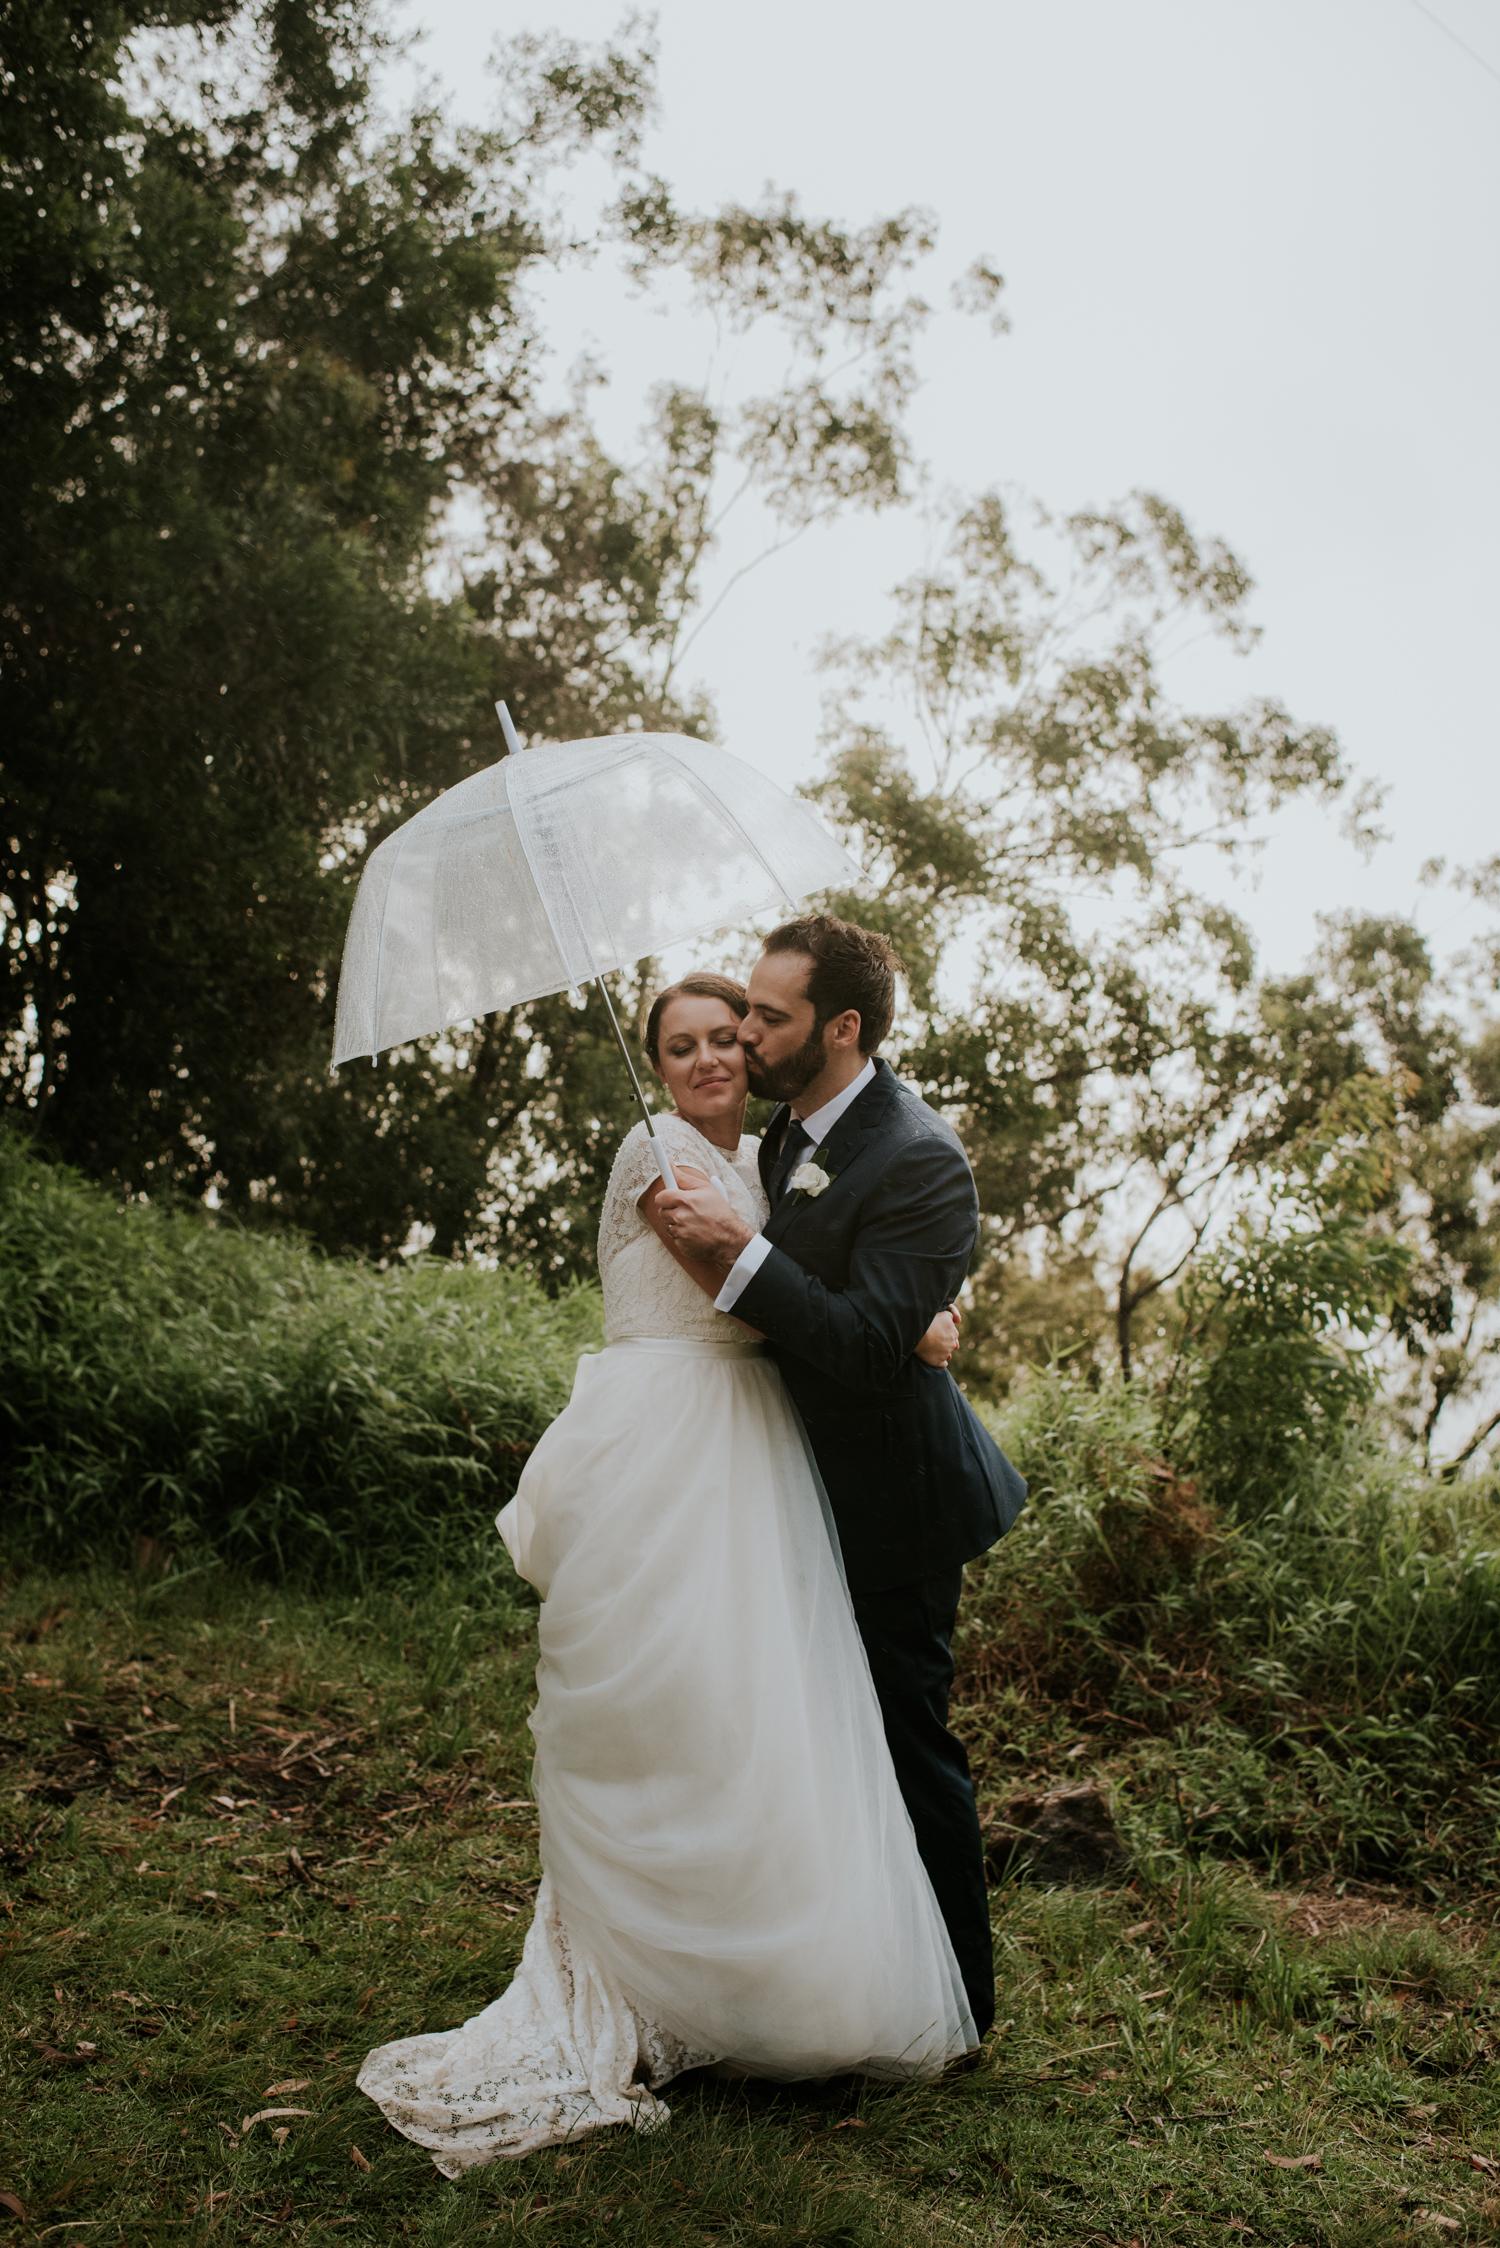 Brisbane Wedding Photographer | Engagement-Elopement Photography-60.jpg